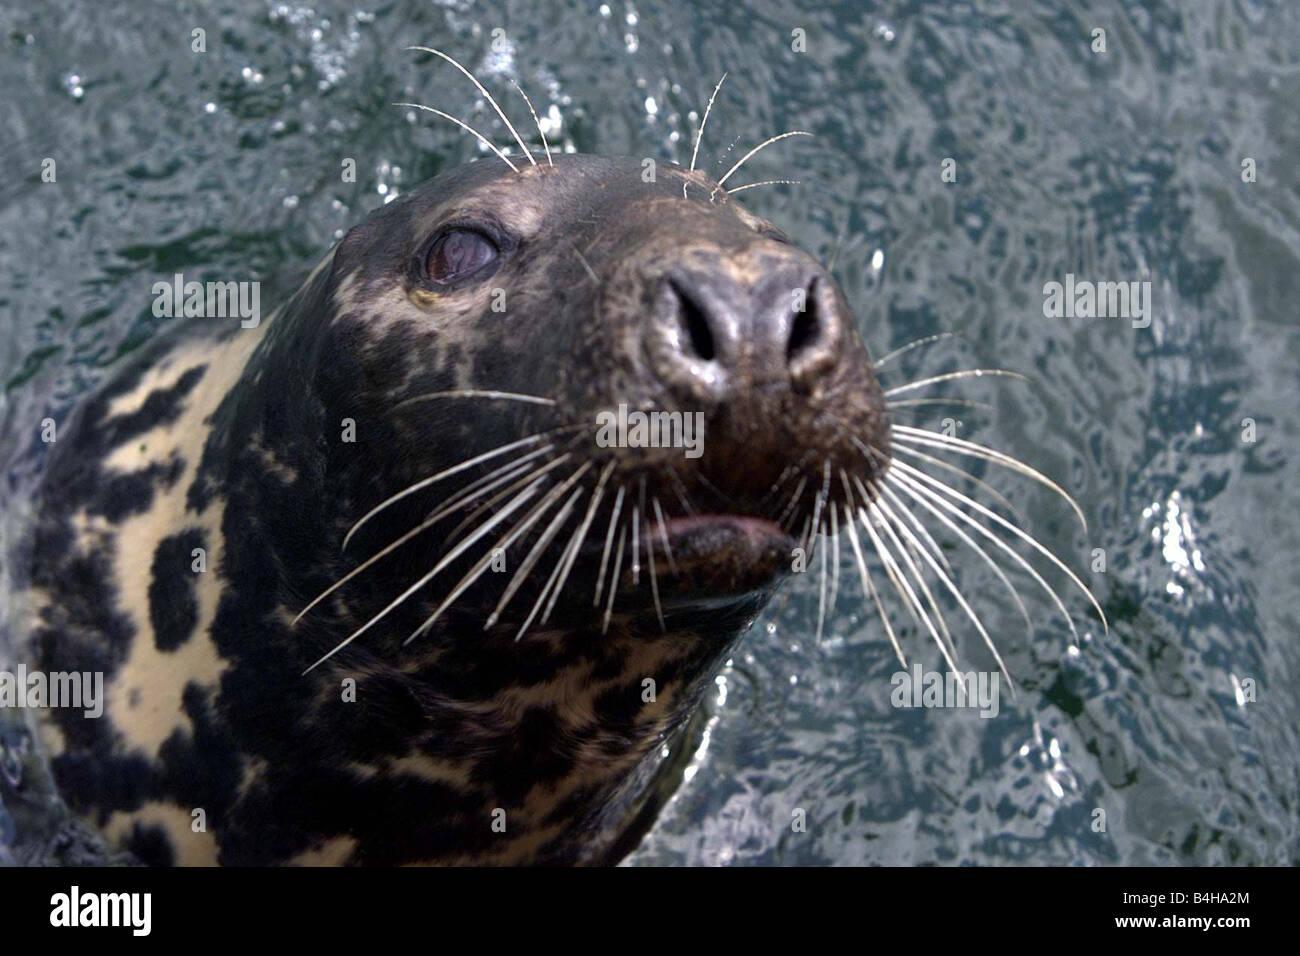 Bangor s Sea Friend Sammy The Seal July 2002 Sammy the Seal in Bangor Marina - Stock Image